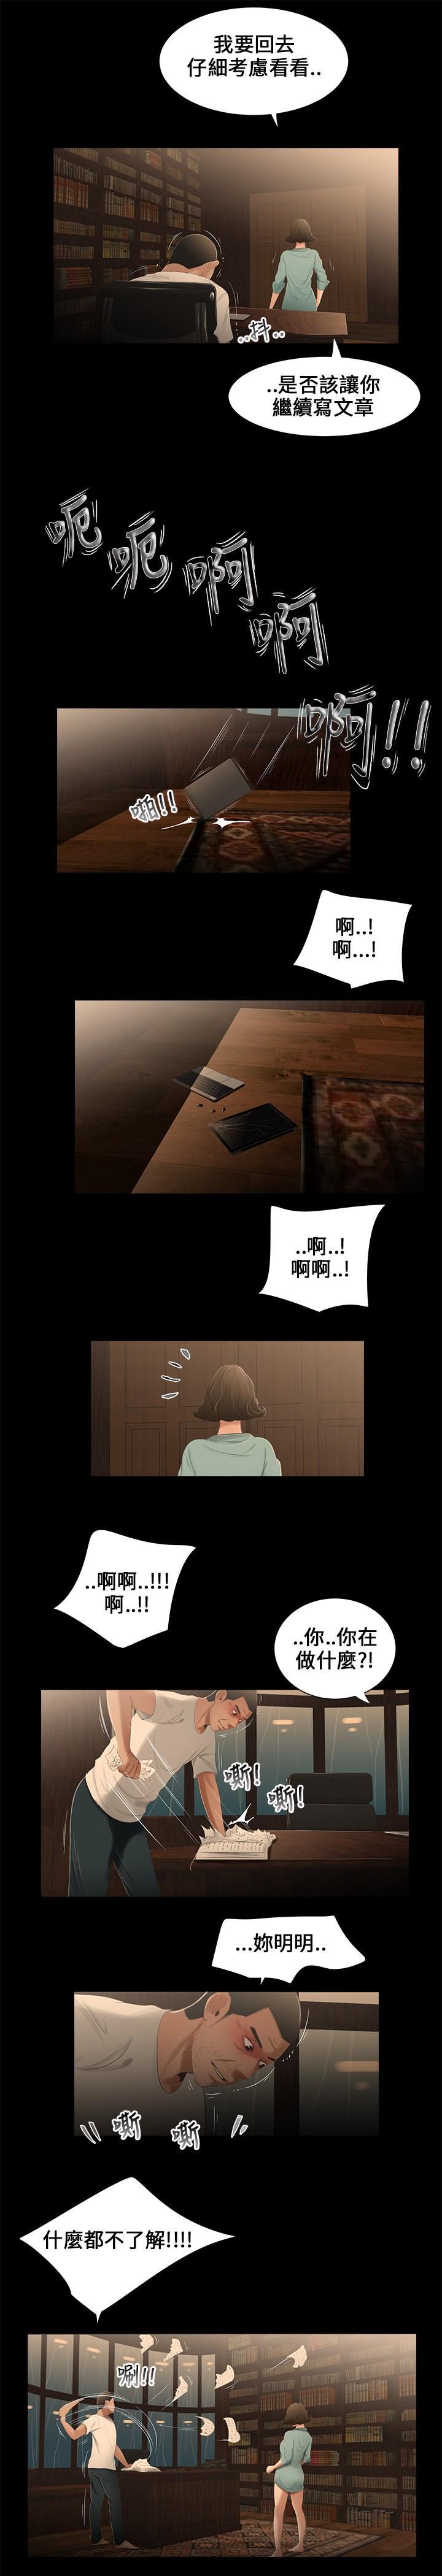 Three sisters 三姐妹Ch.13~19 (Chinese)中文 83